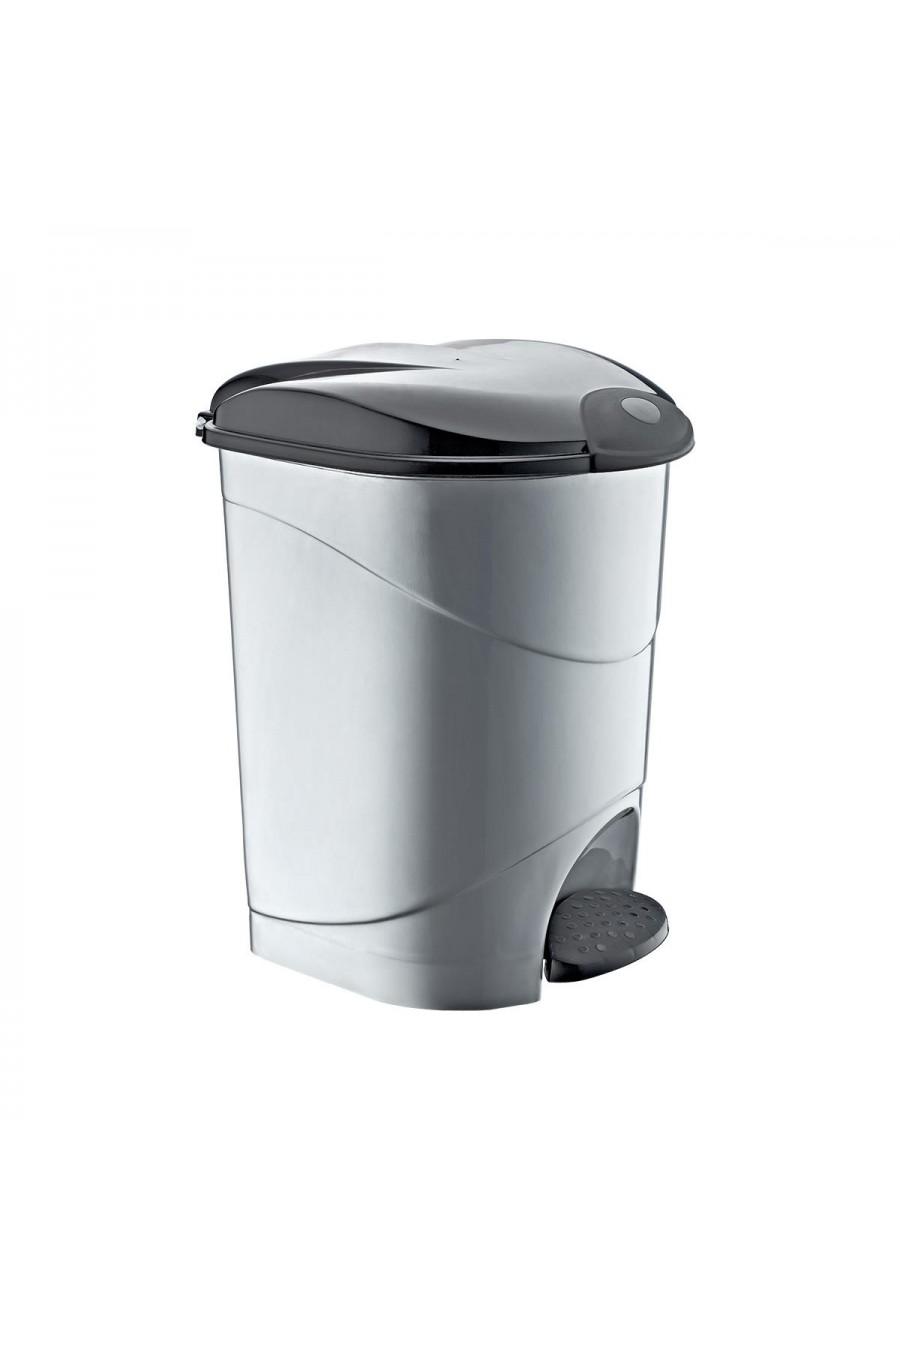 PlastArt Pedallı Çöp Kovası | Ofis Çöp Kovası